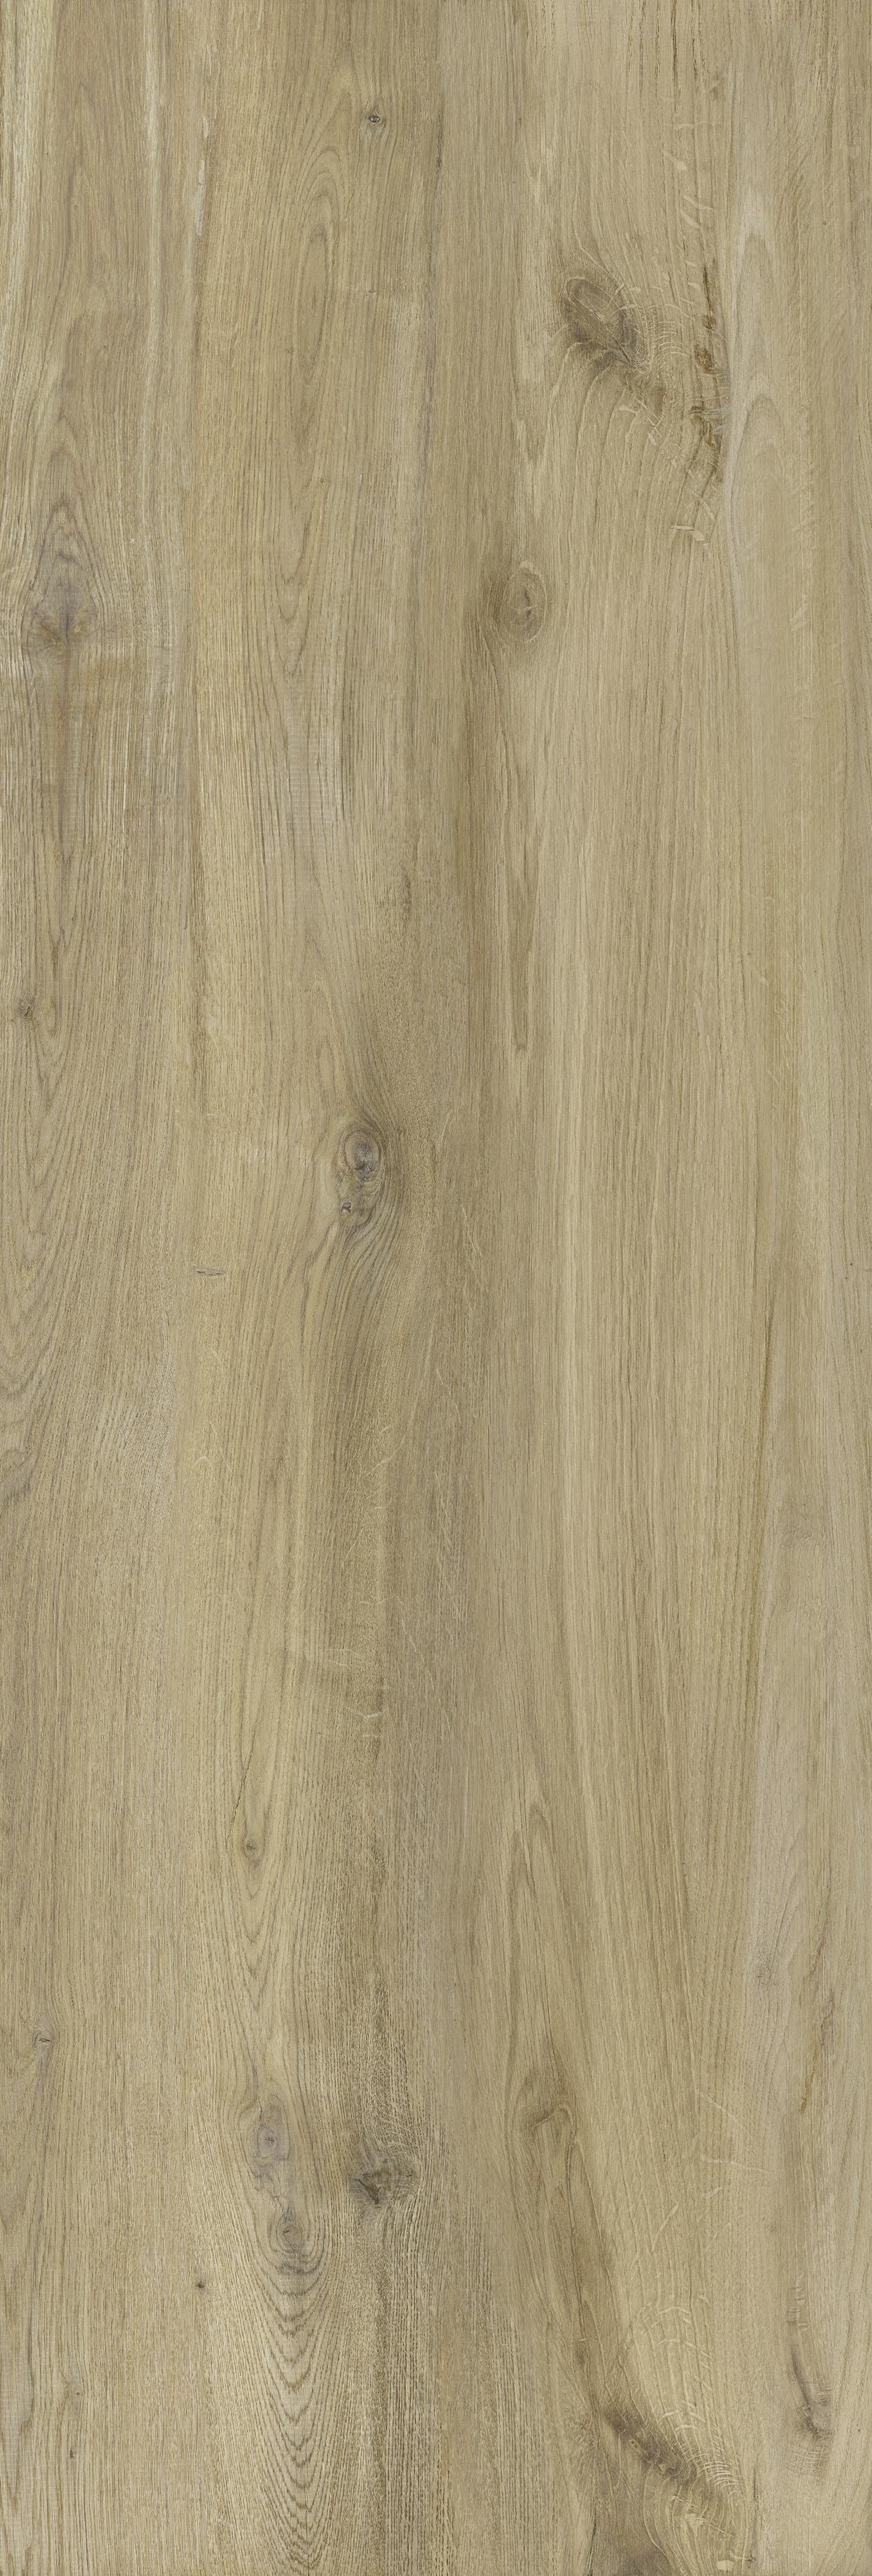 Grove Light Brown Porcelain Planks 1200x400x20mm – 19.2m2 Pack